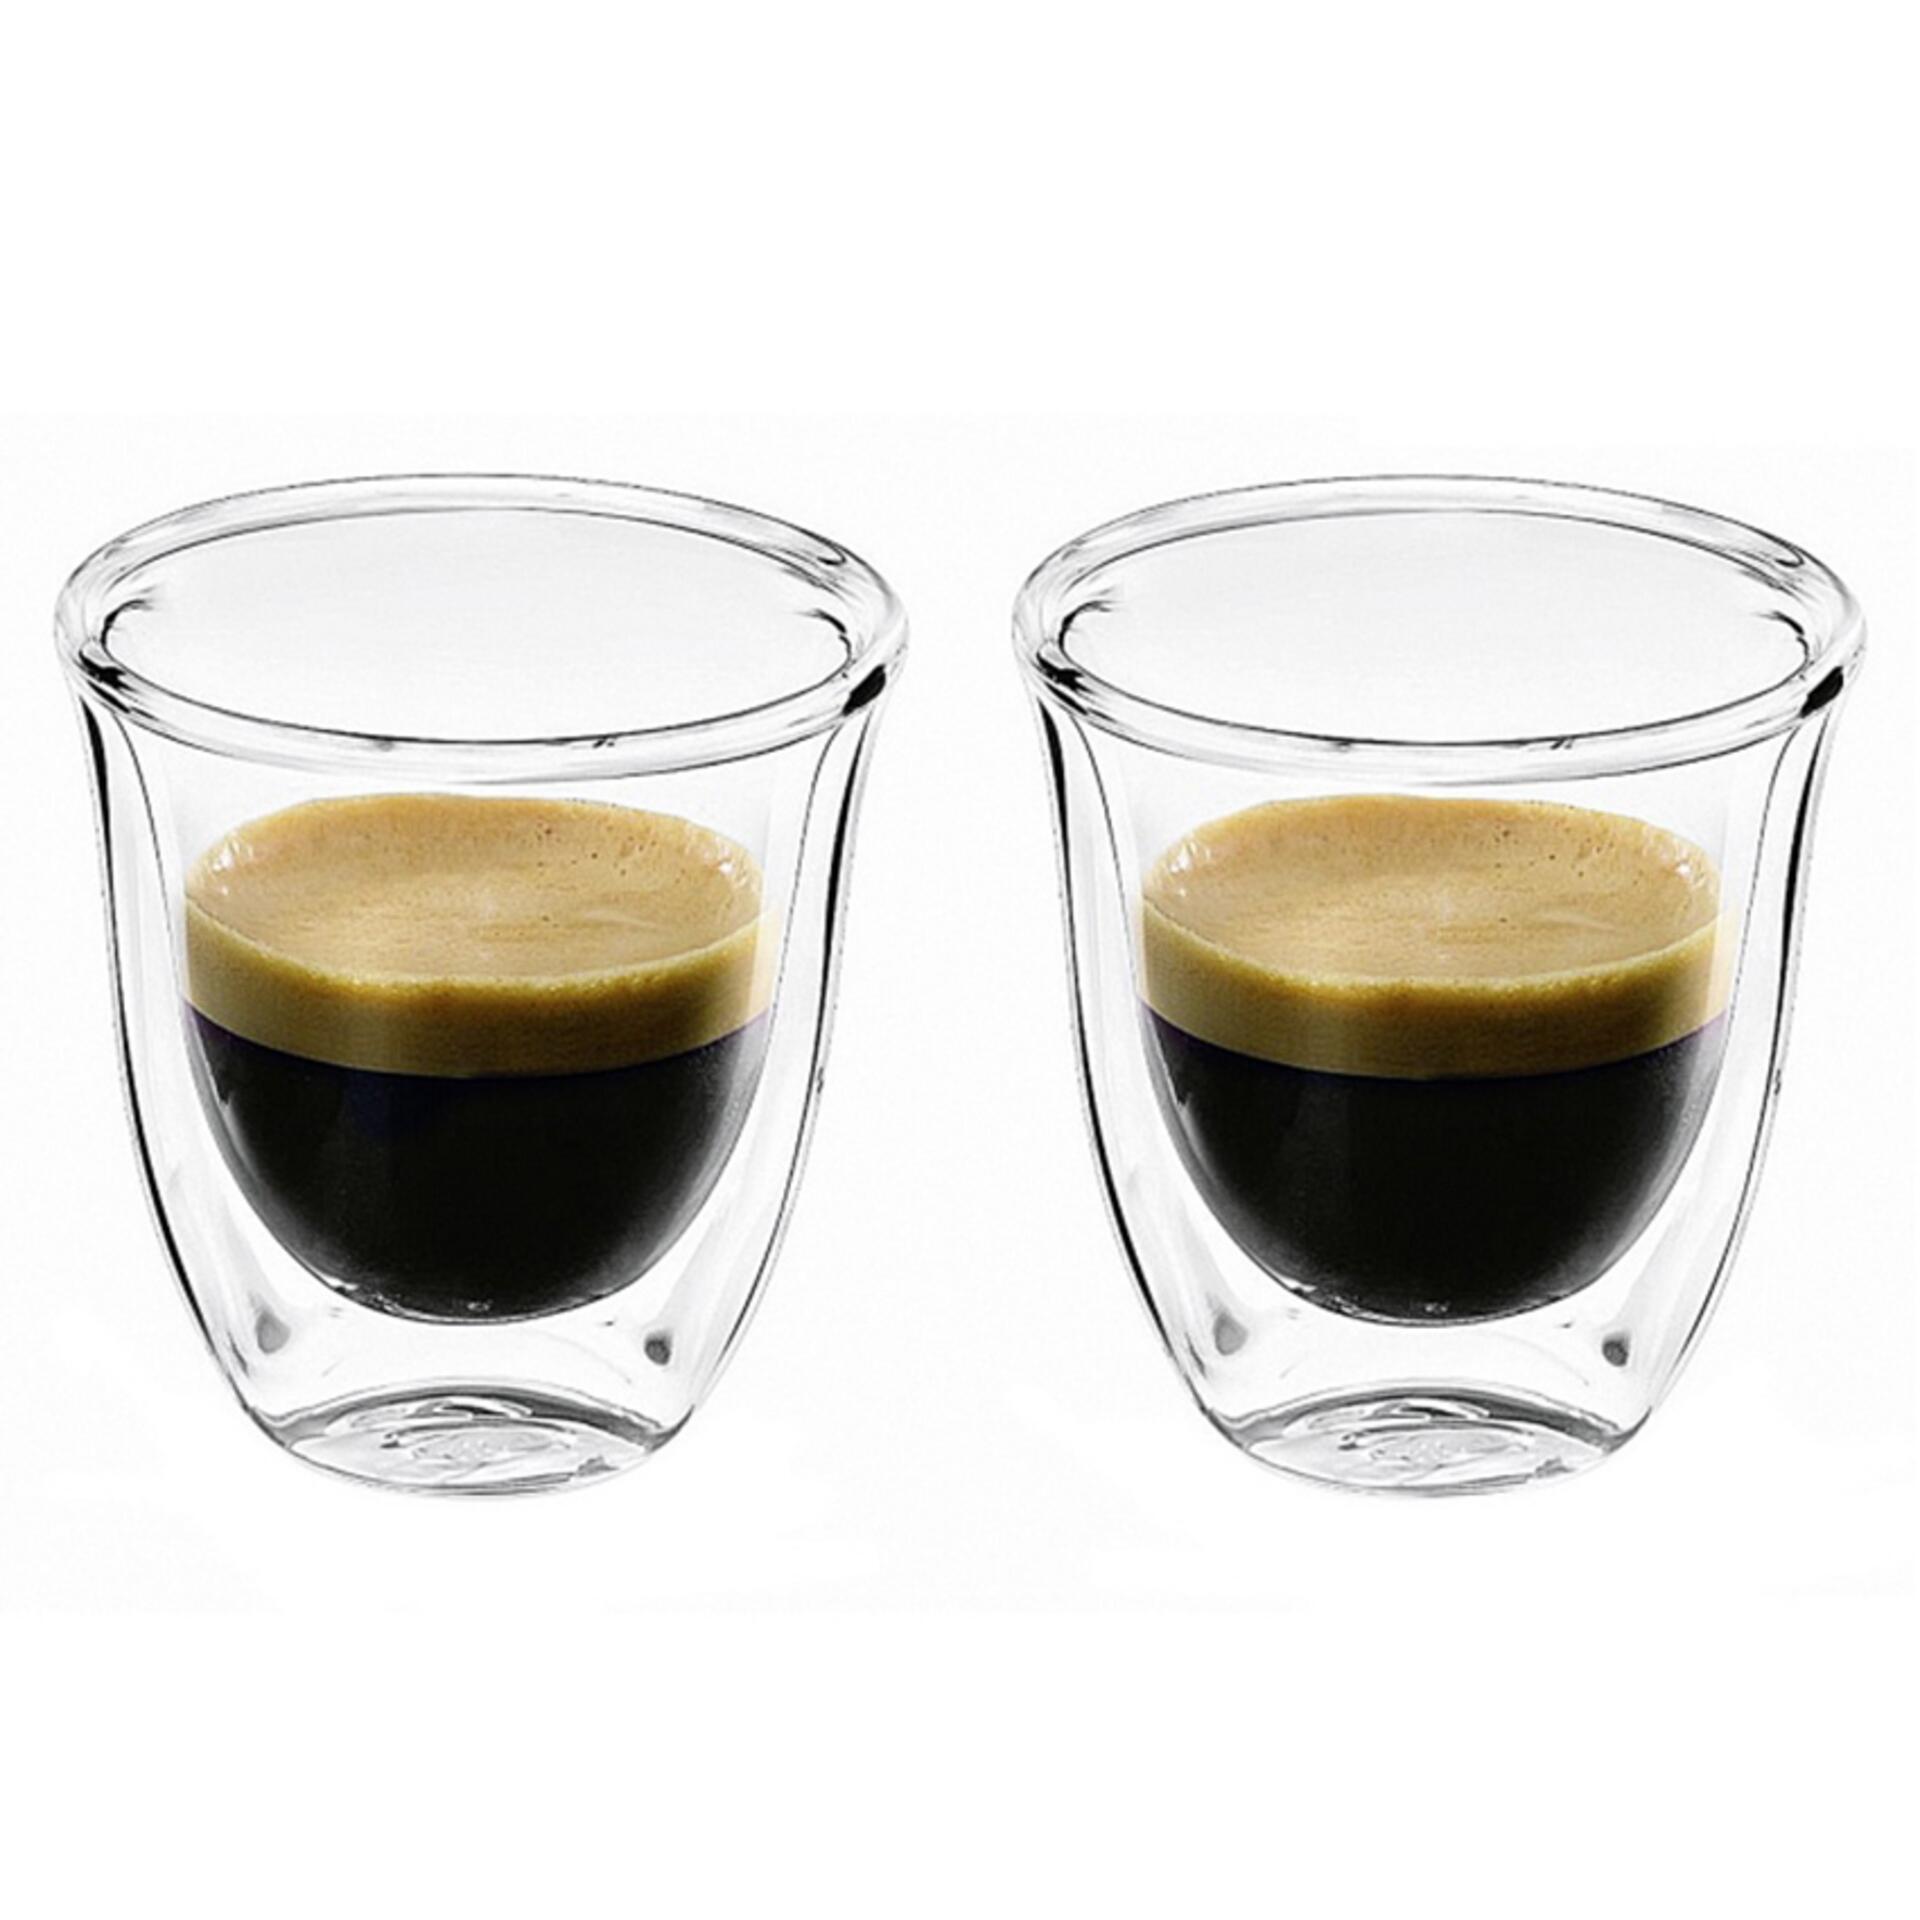 De'Longhi Espressotassen aus Glas 2er-Set